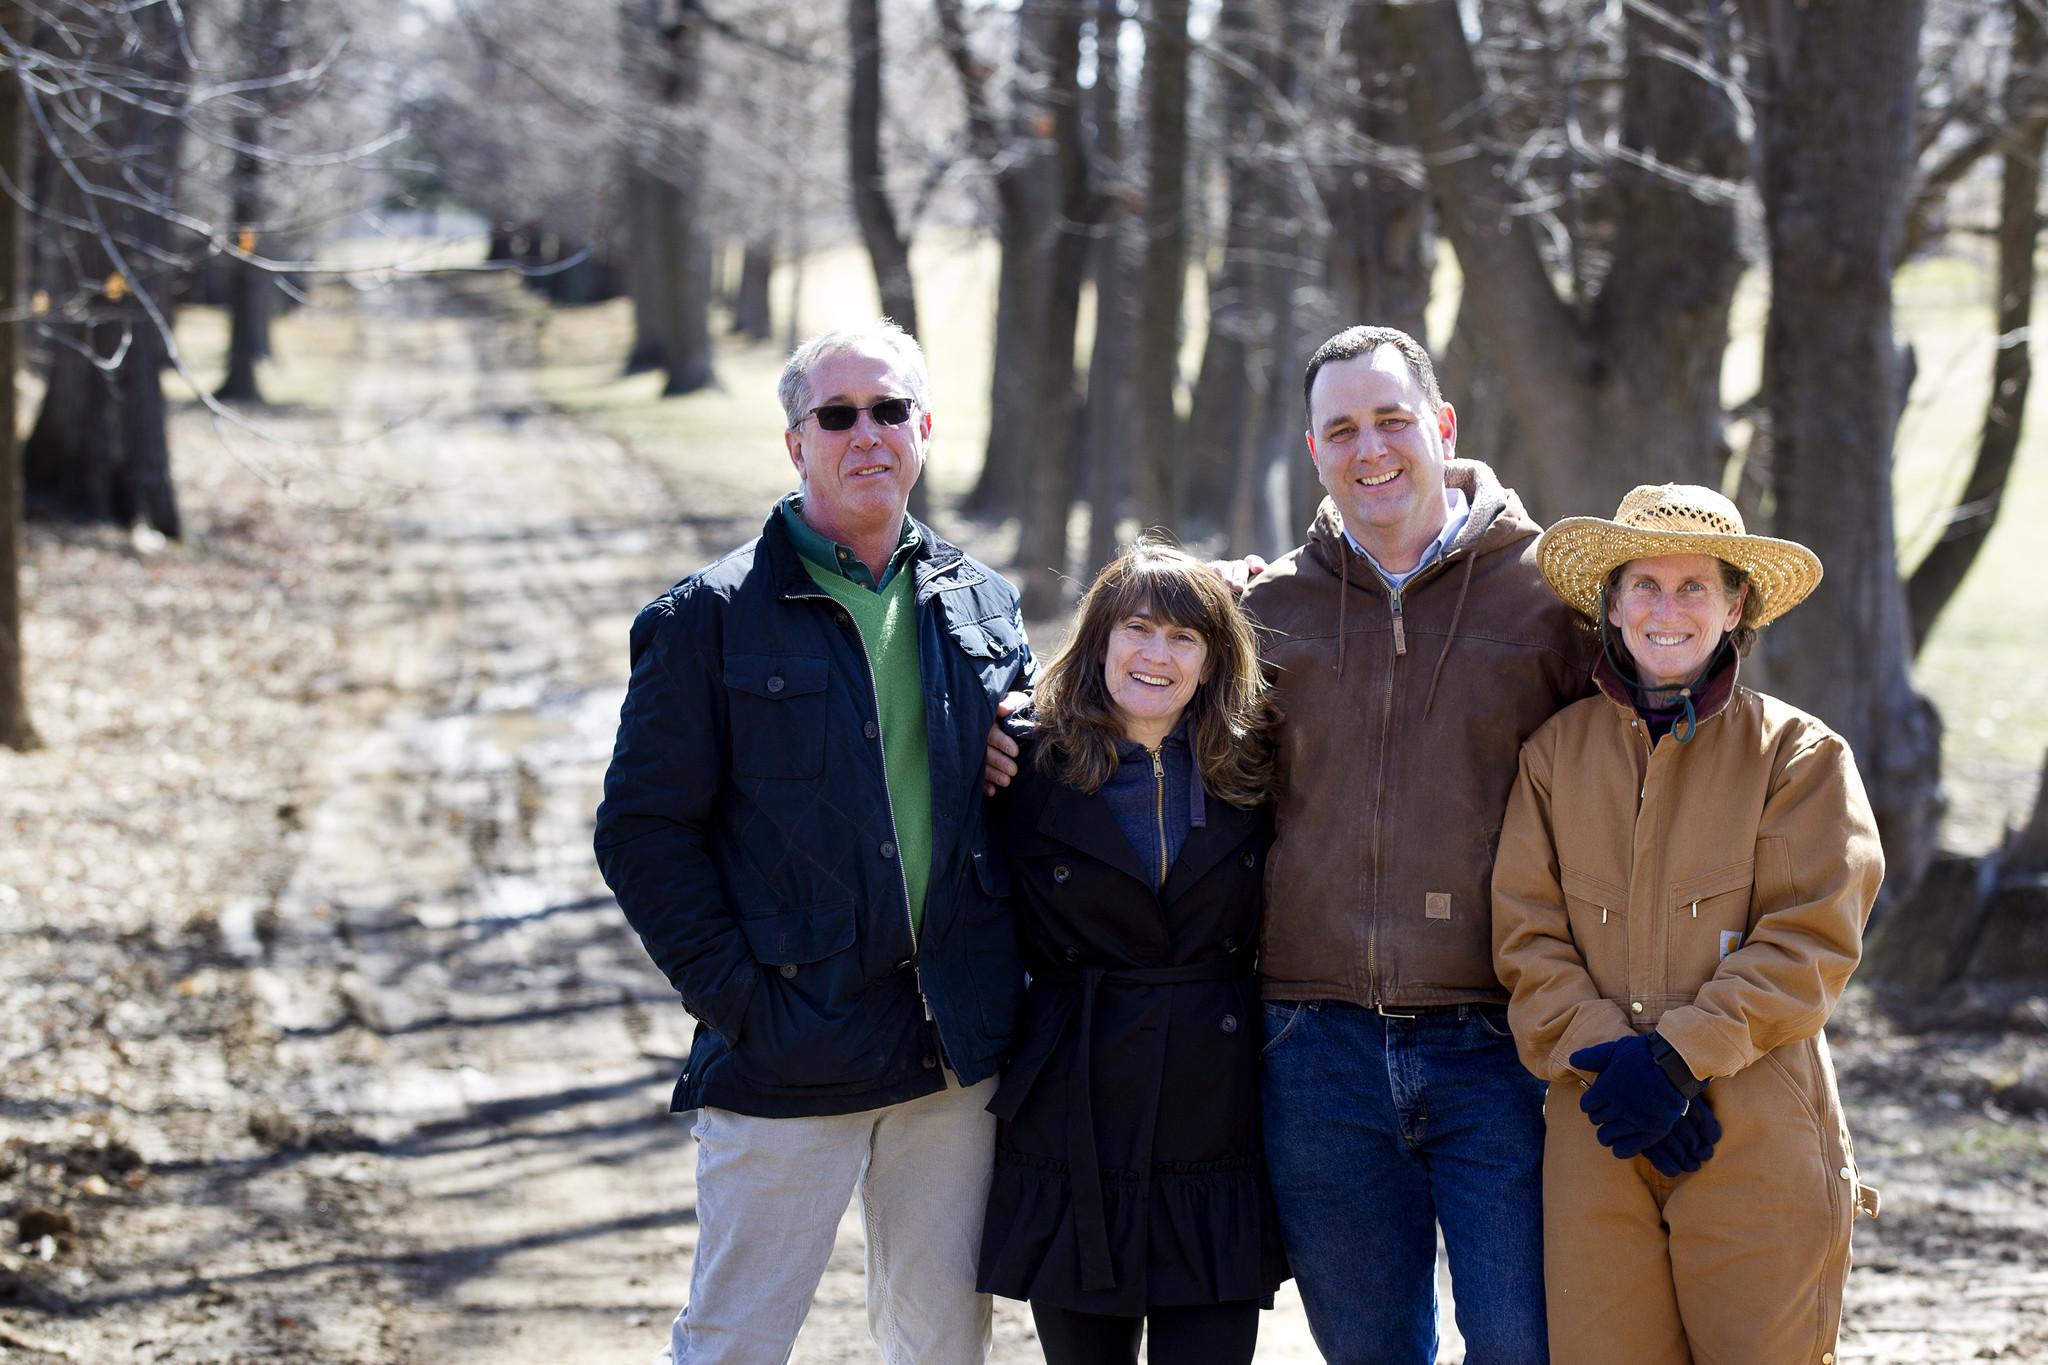 Carroll Farm To Table Raises Livestock Fresh From The Farm